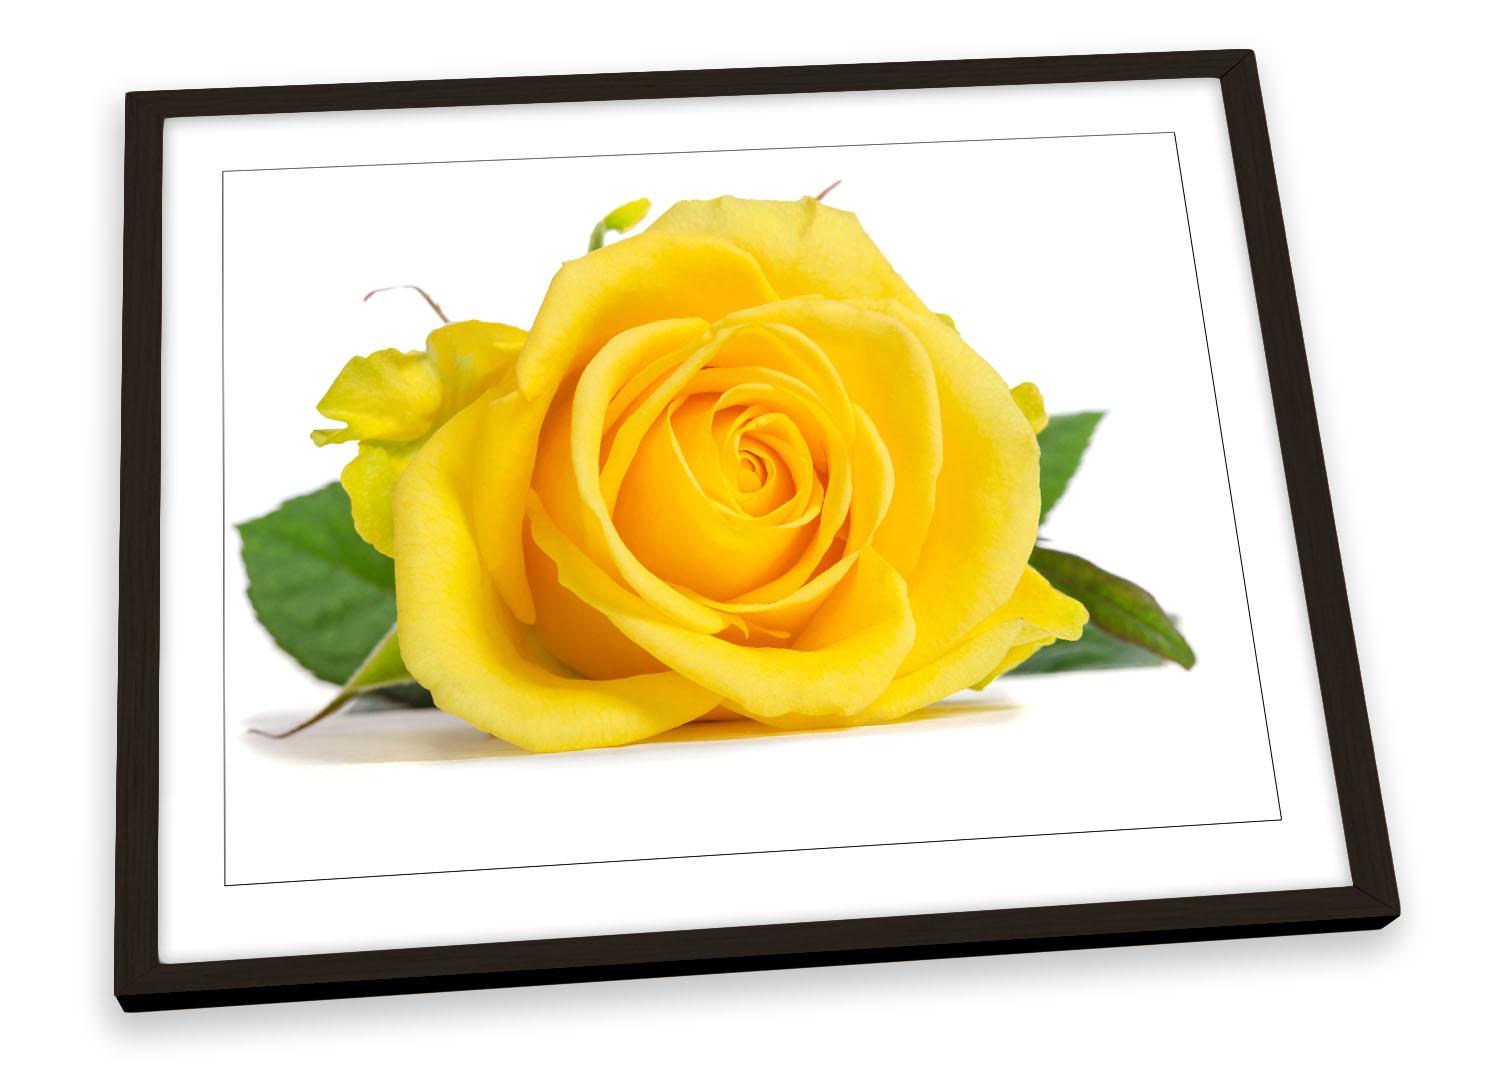 FL018 Orange Rose Floral Canvas Wall Art Framed Flowers Picture Print